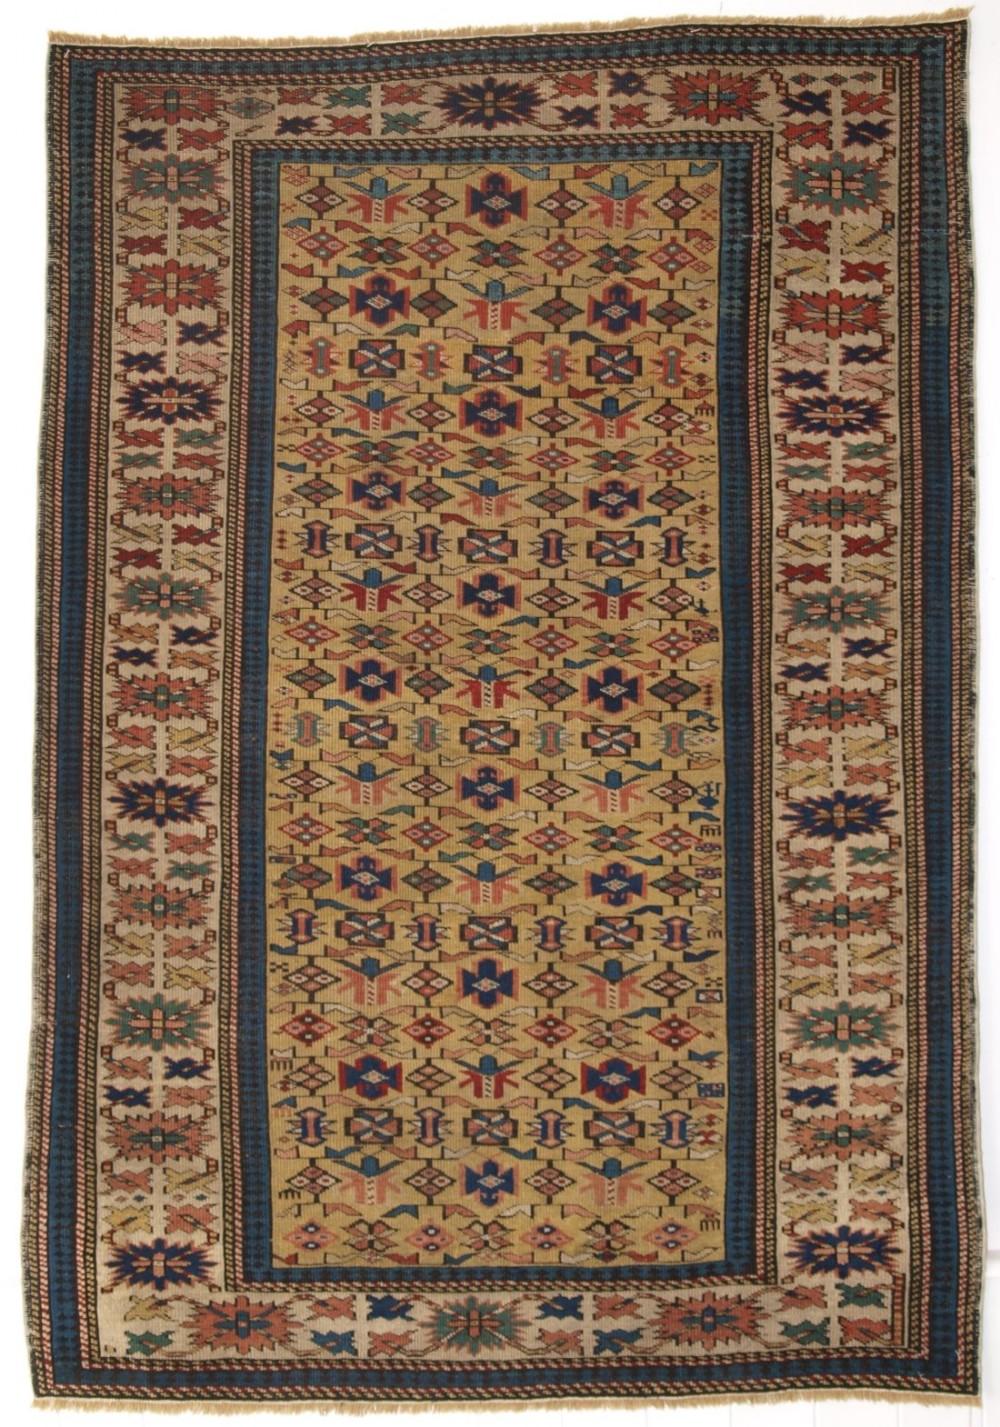 antique caucasian kuba rug with yellow ground very fine weave circa 1880